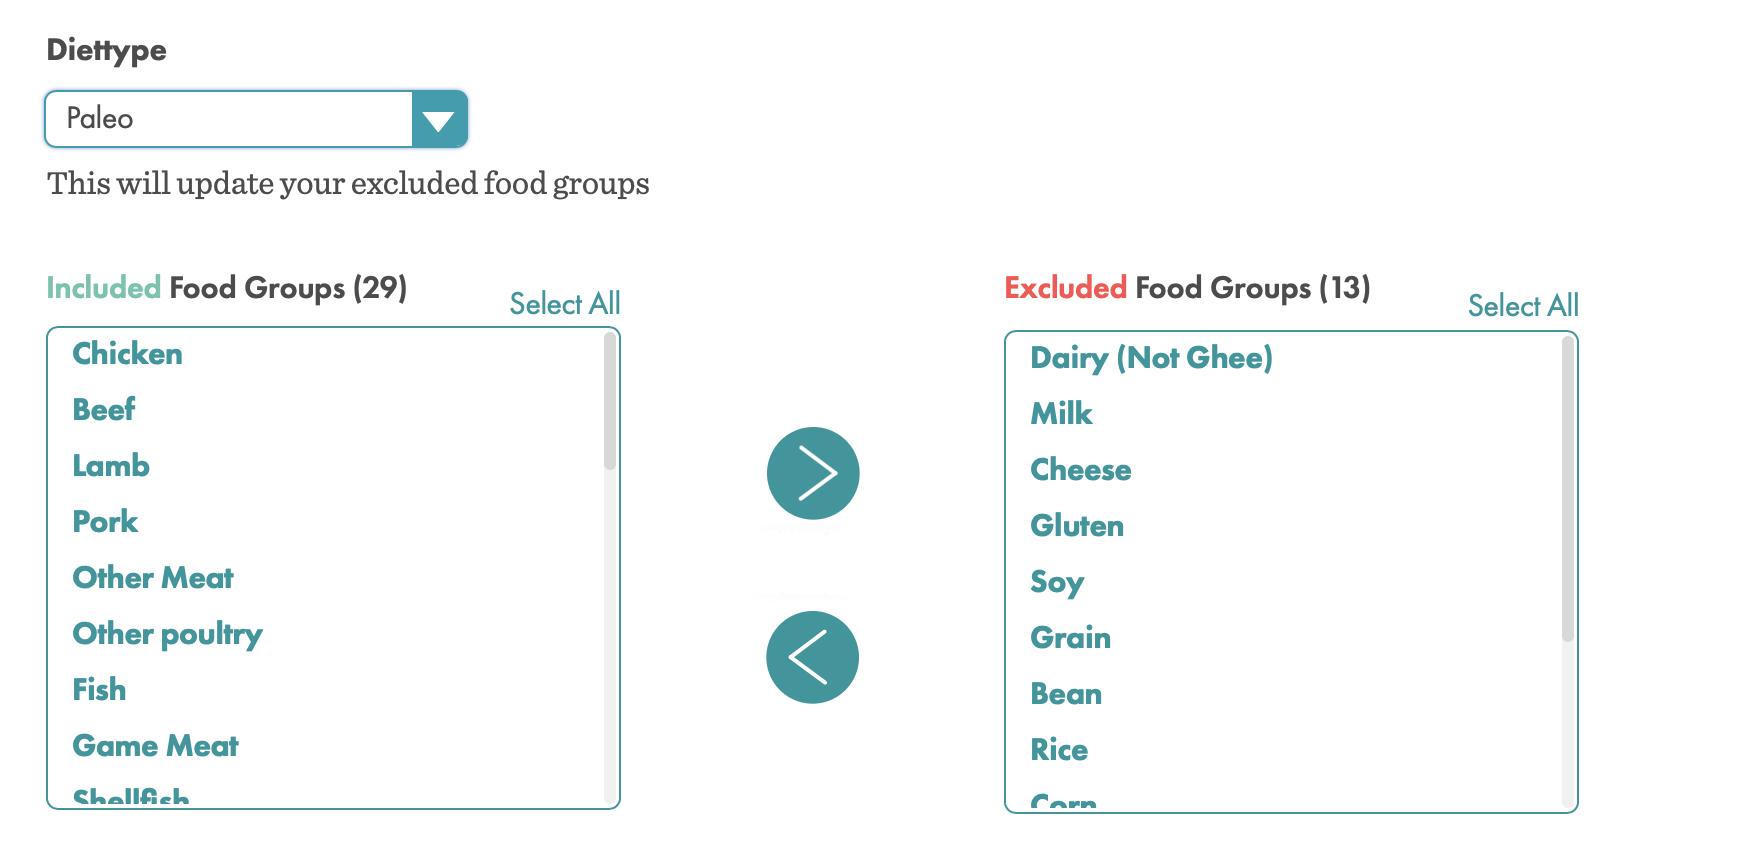 Diet_Type_Food_Groups.png